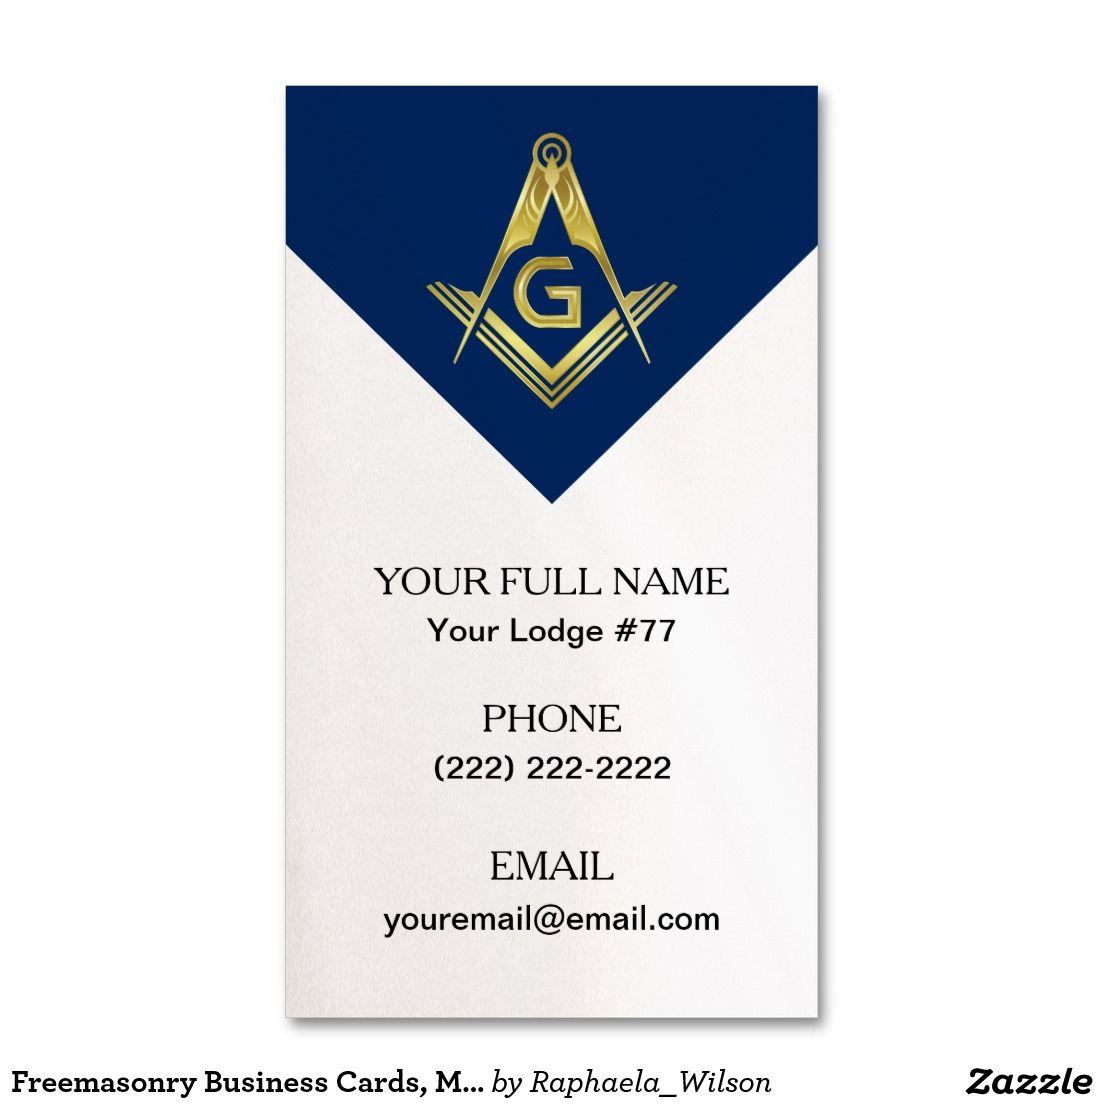 Freemasonry Business Cards, Masonic Blue Navy Gold Business